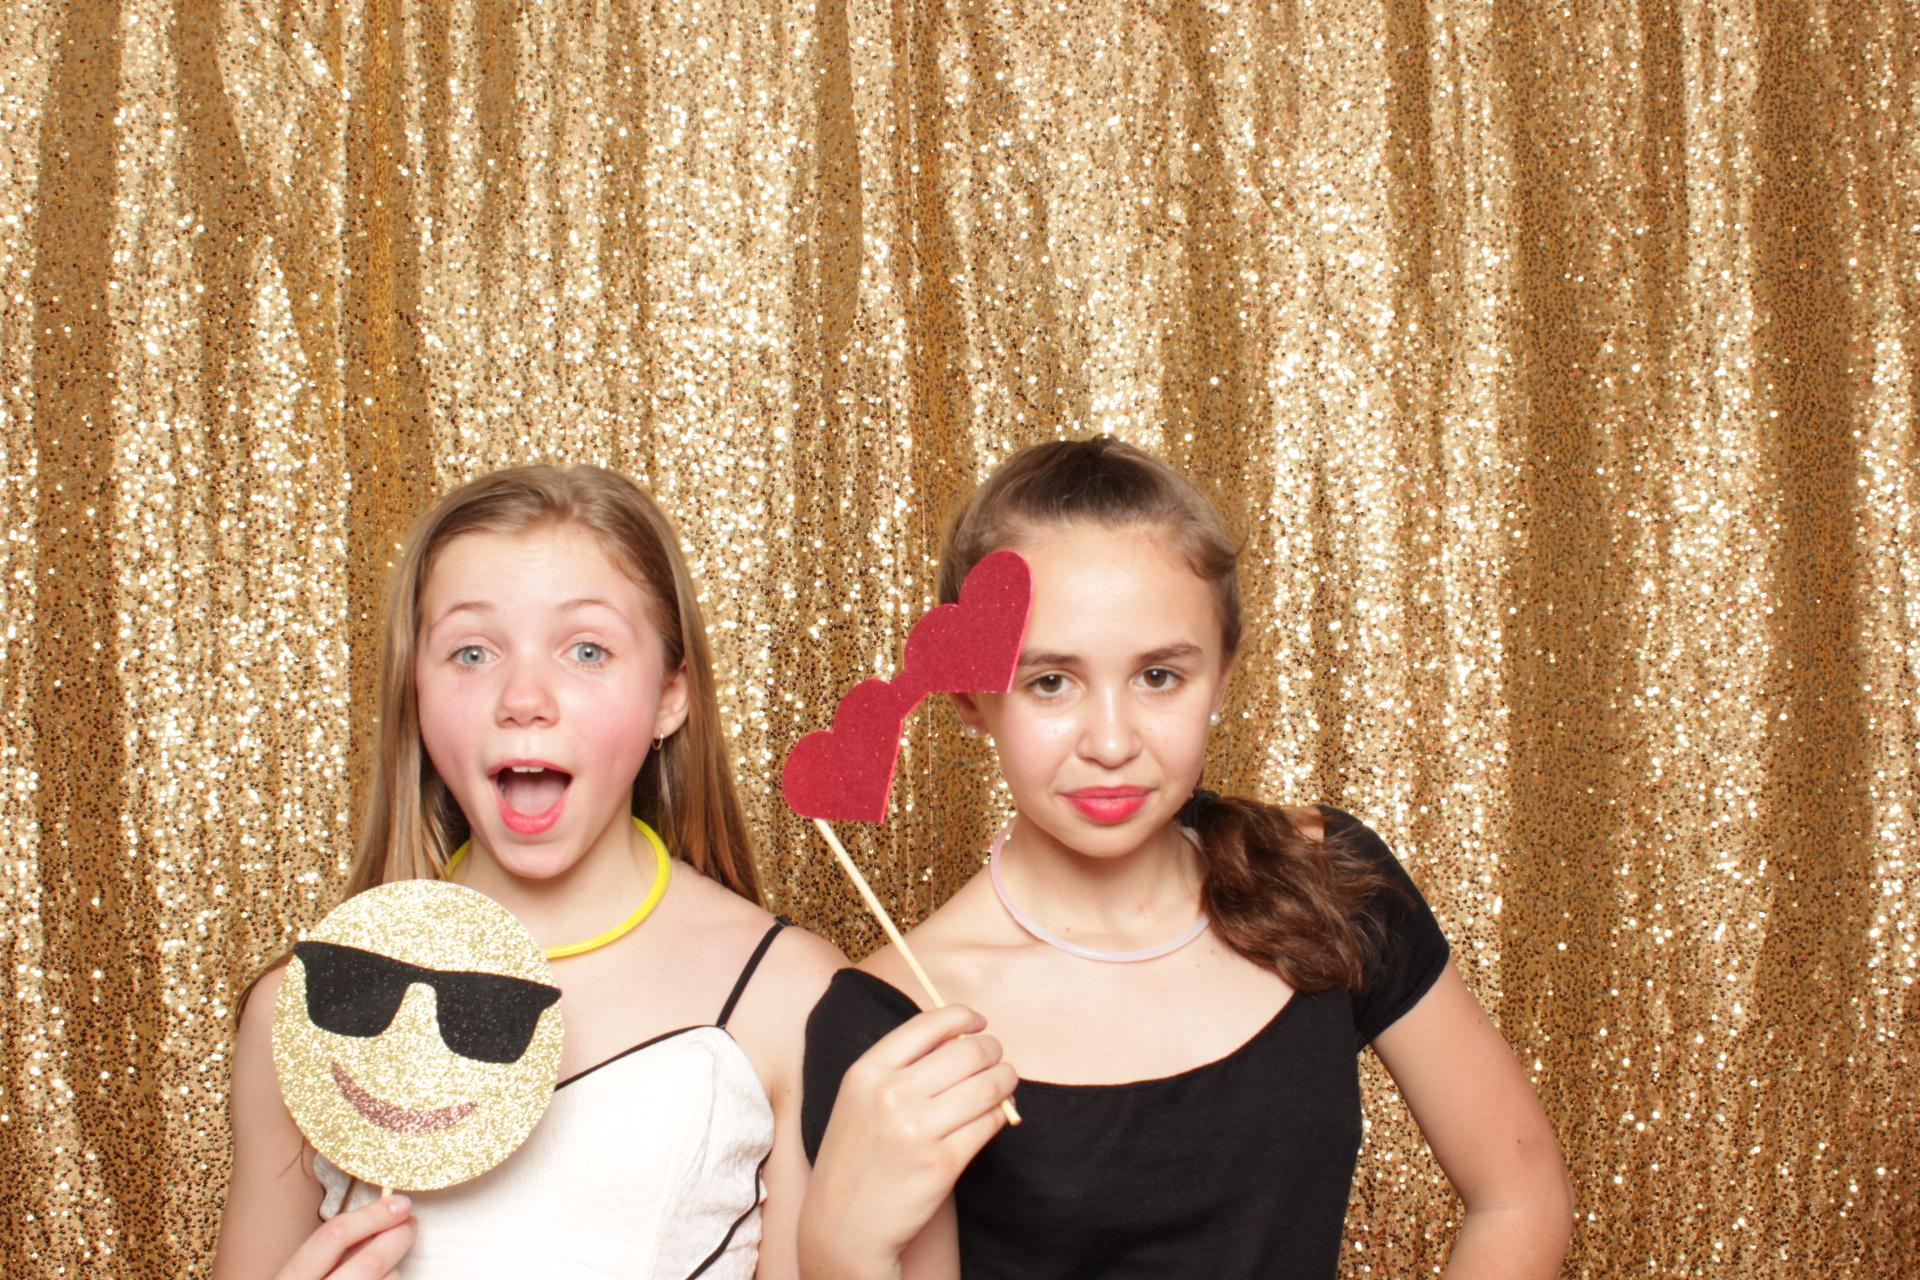 Bat-mitzvah-photo-booth-brooklyn-celebration.jpg